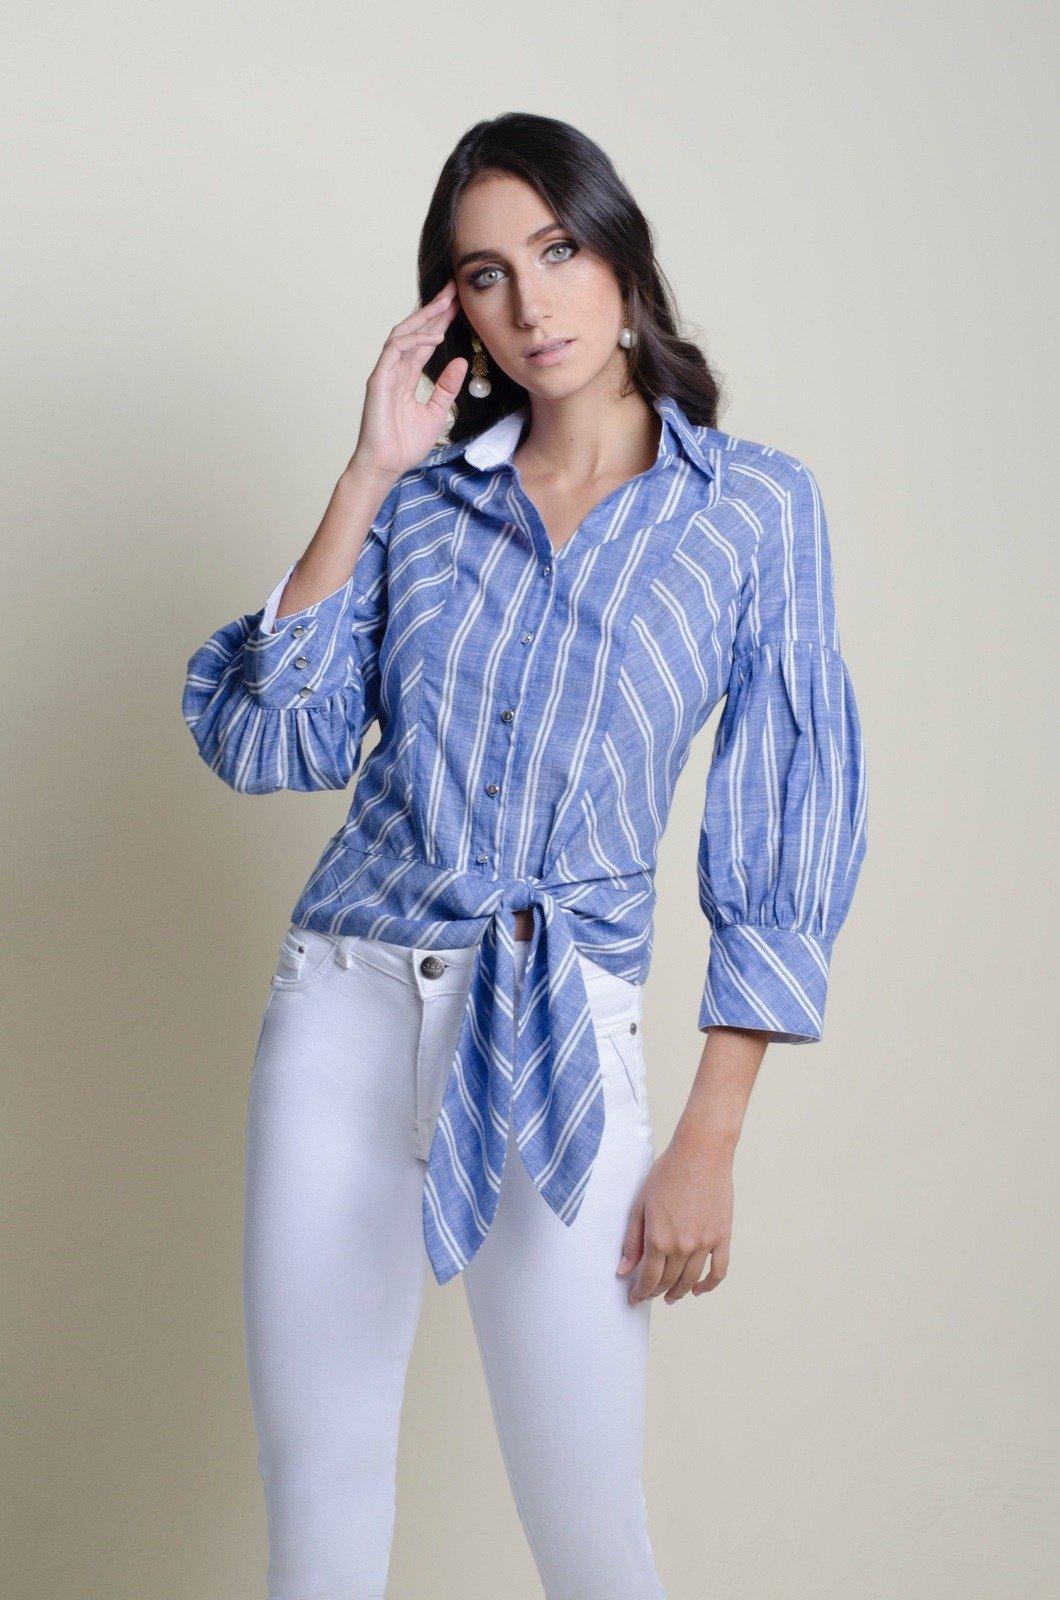 Blusa camisera con nudo de amarrar - Chazari 4058-20 R